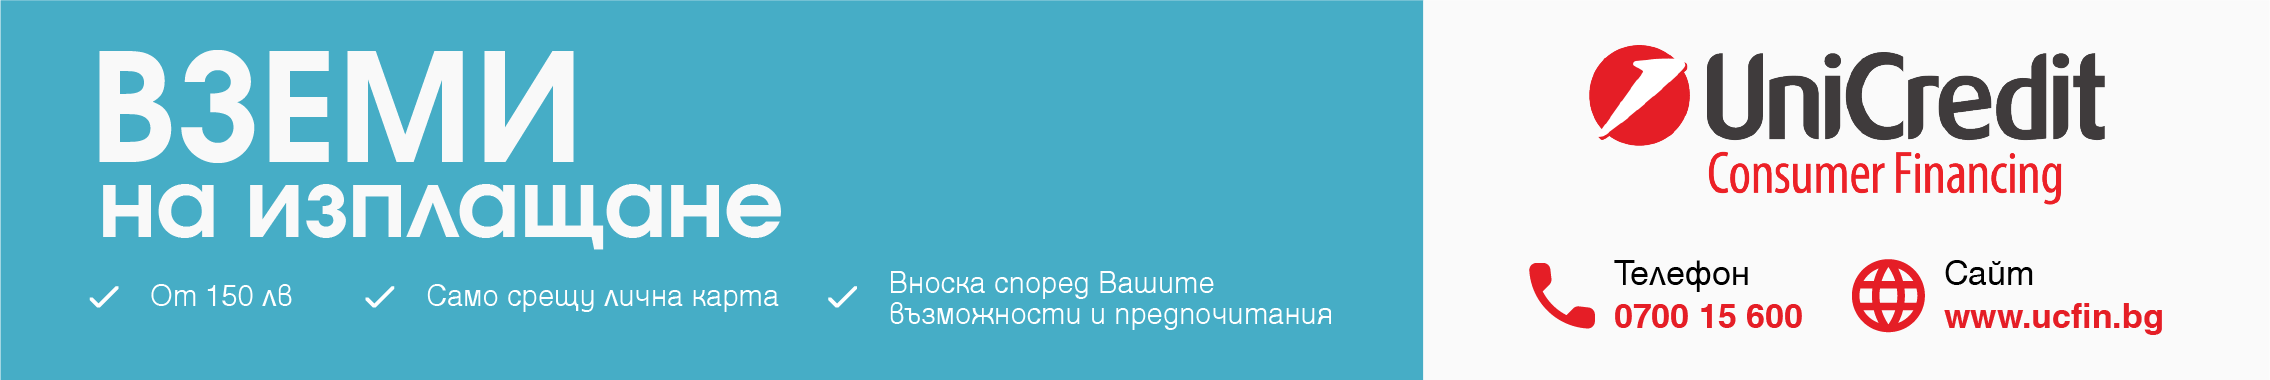 Banner Unicredit